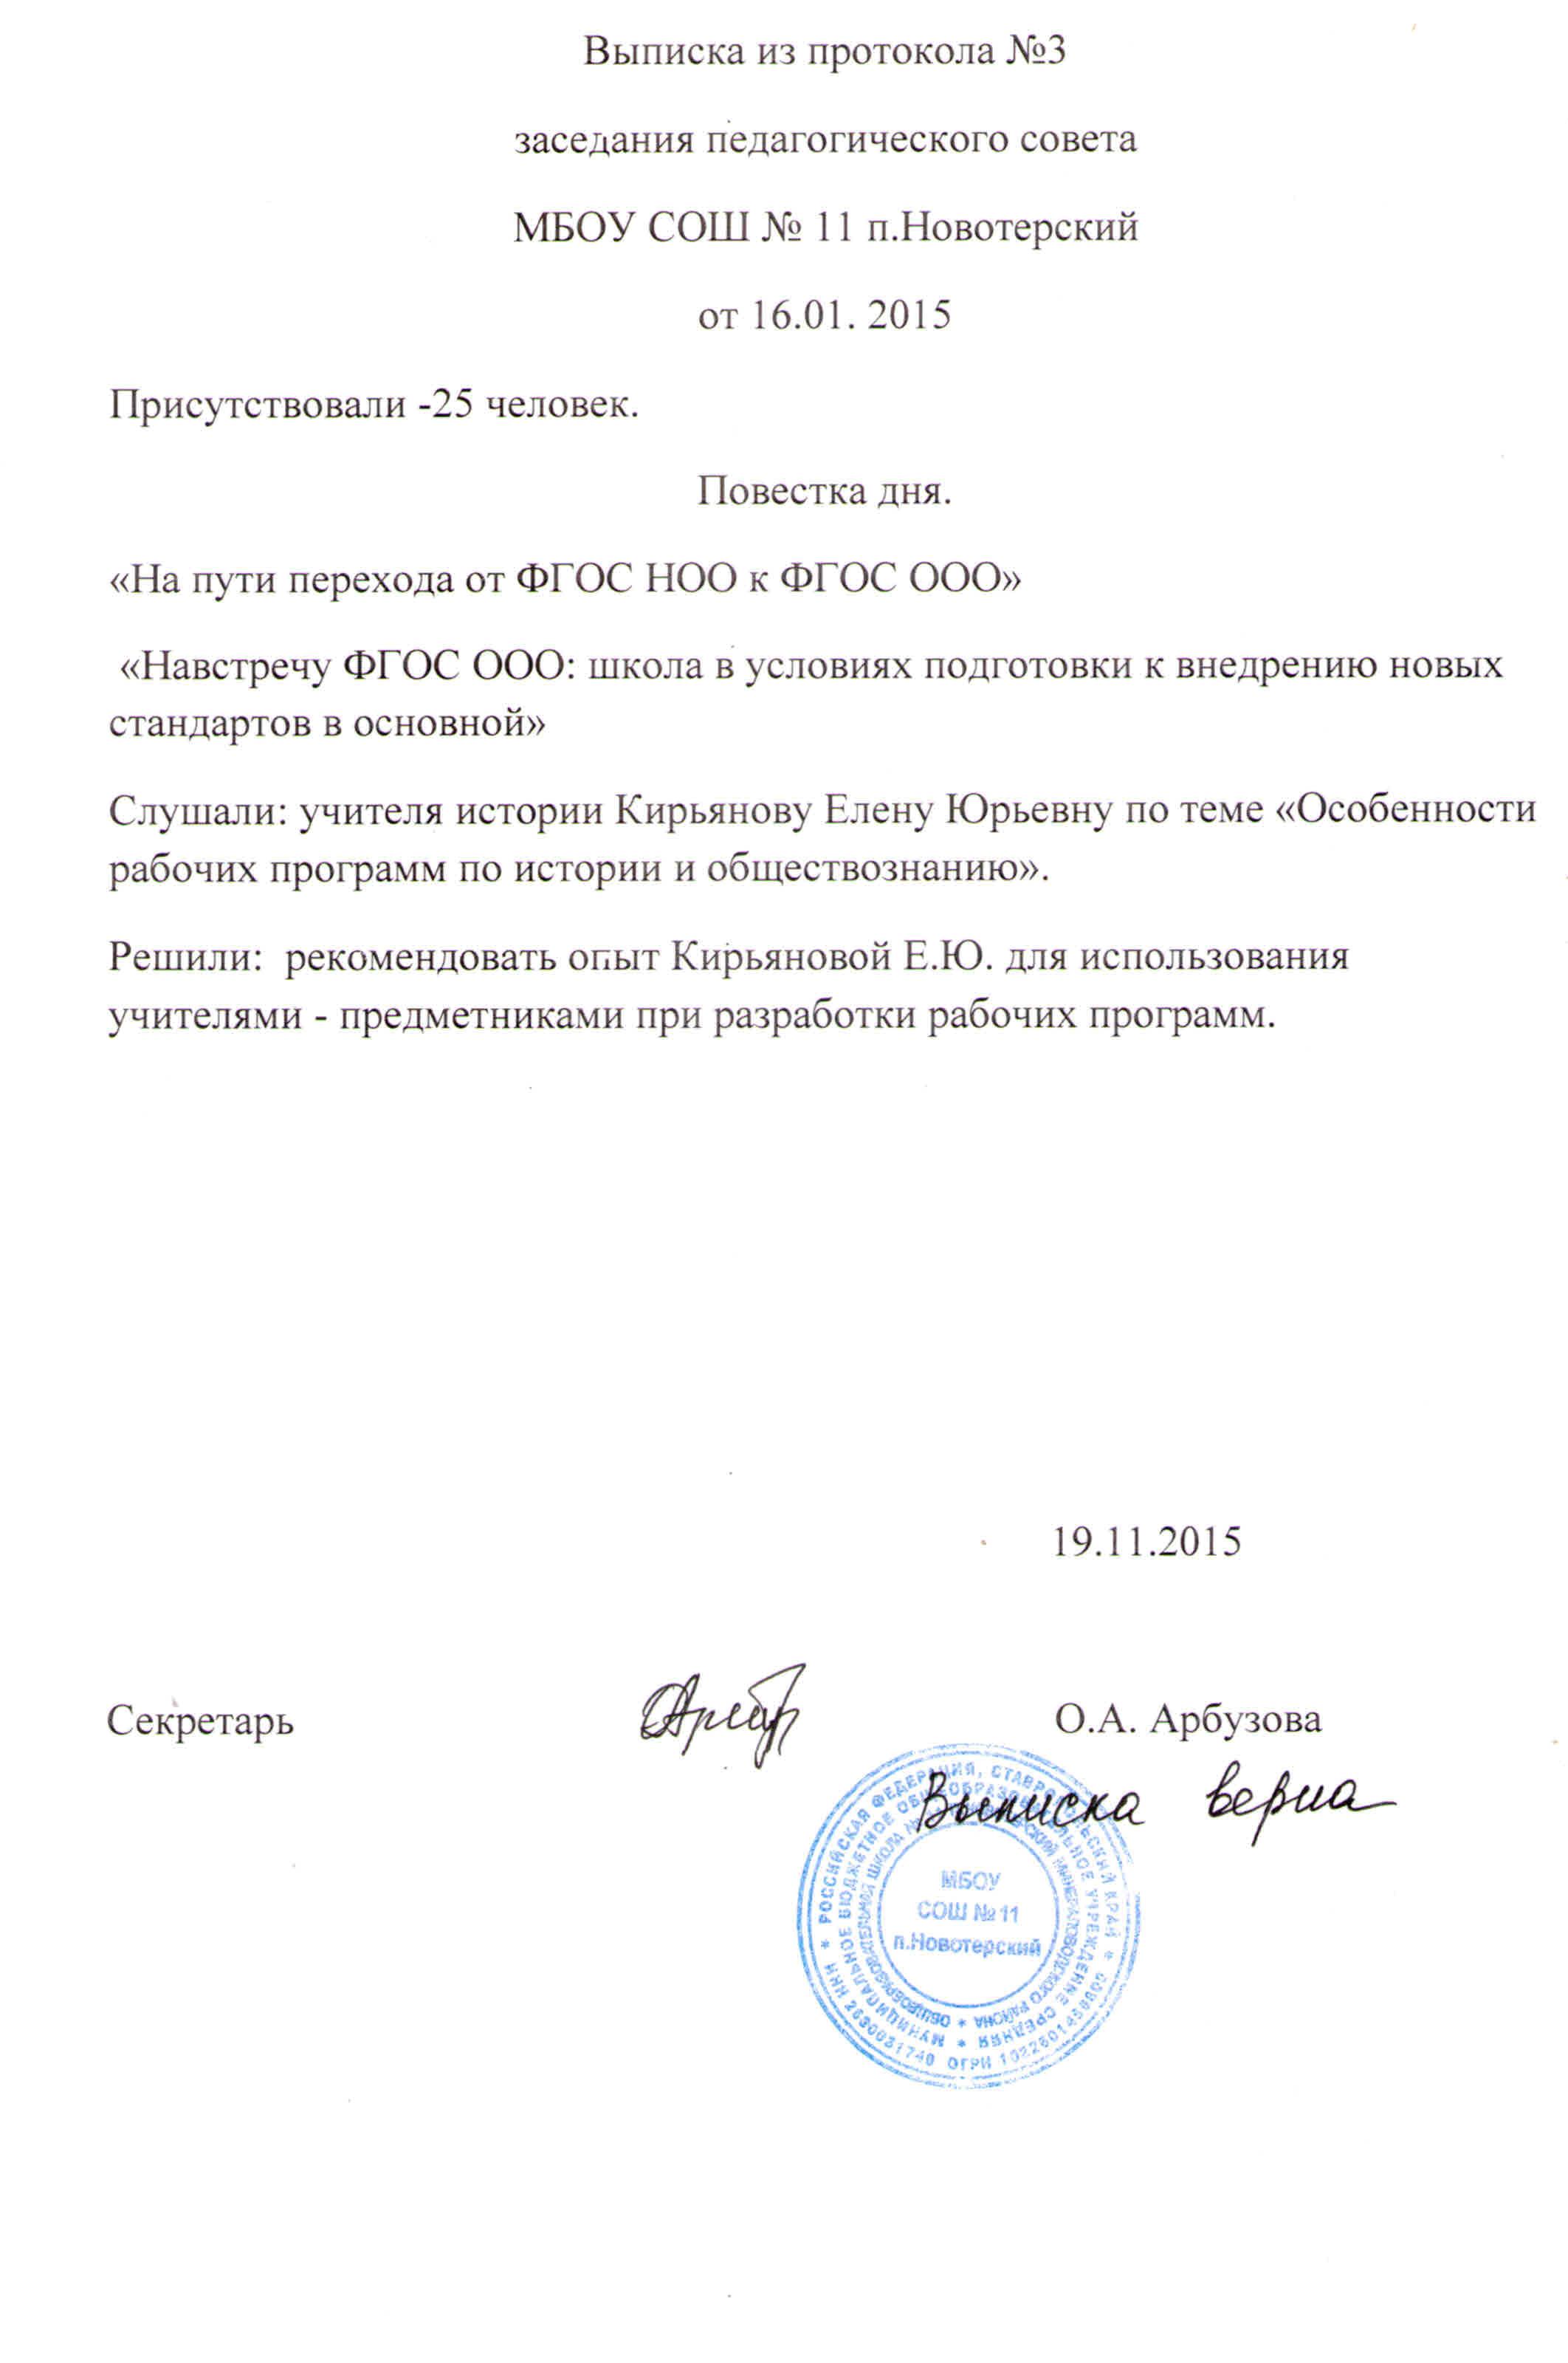 C:\Users\Сергей\Desktop\пс\Document_7.jpg